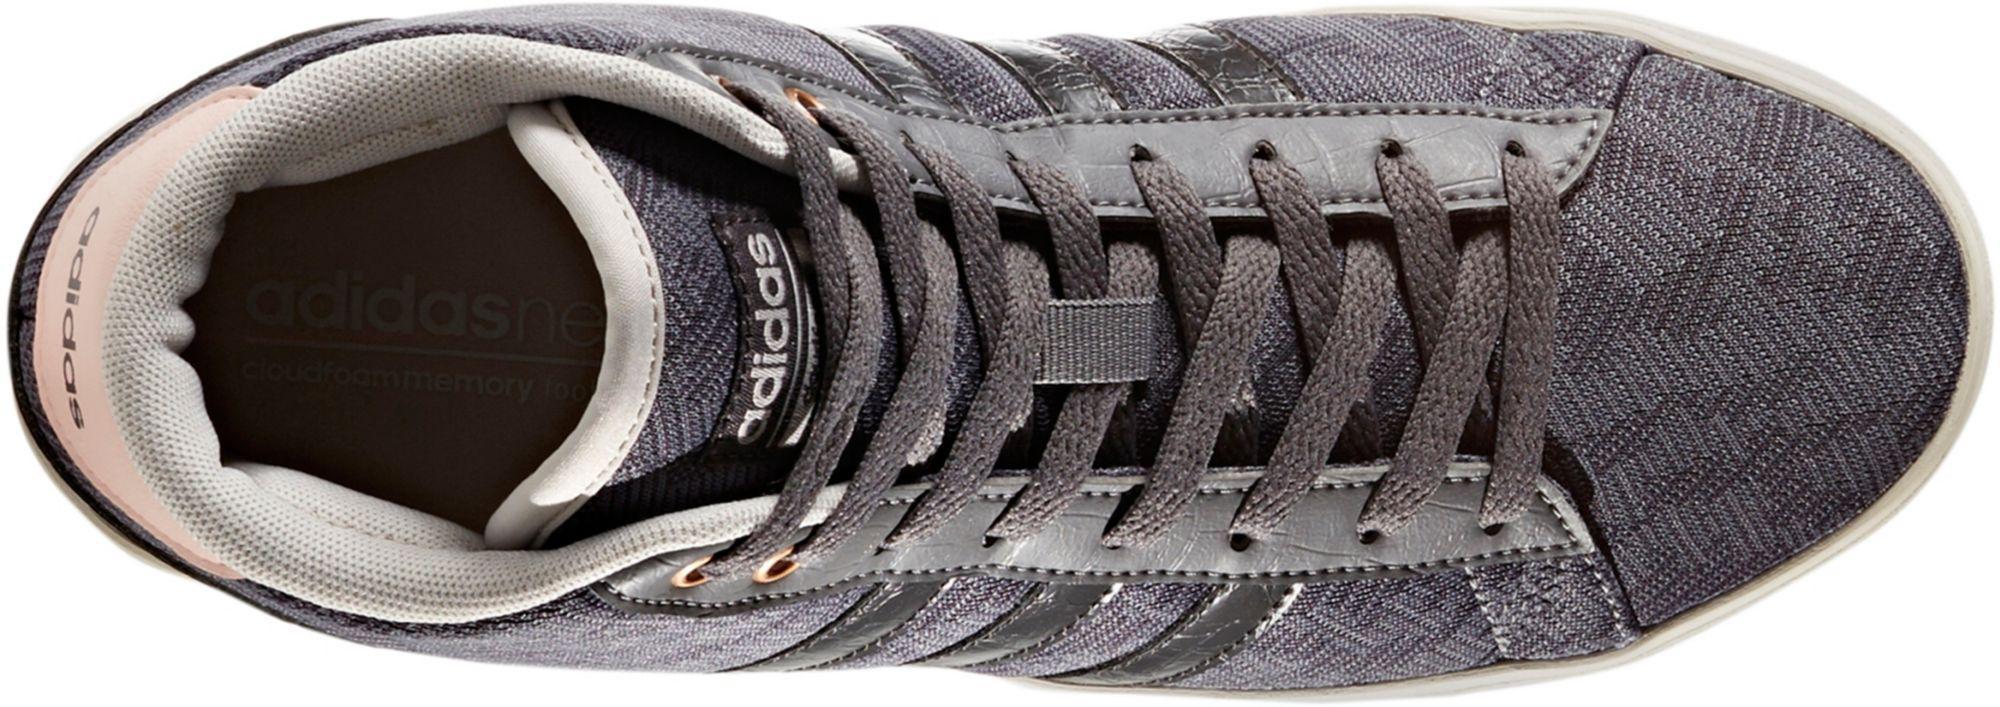 buy popular 7e58f c8afb Lyst - adidas Originals Cloudfoam Daily Qt Mid Shoes in Gray